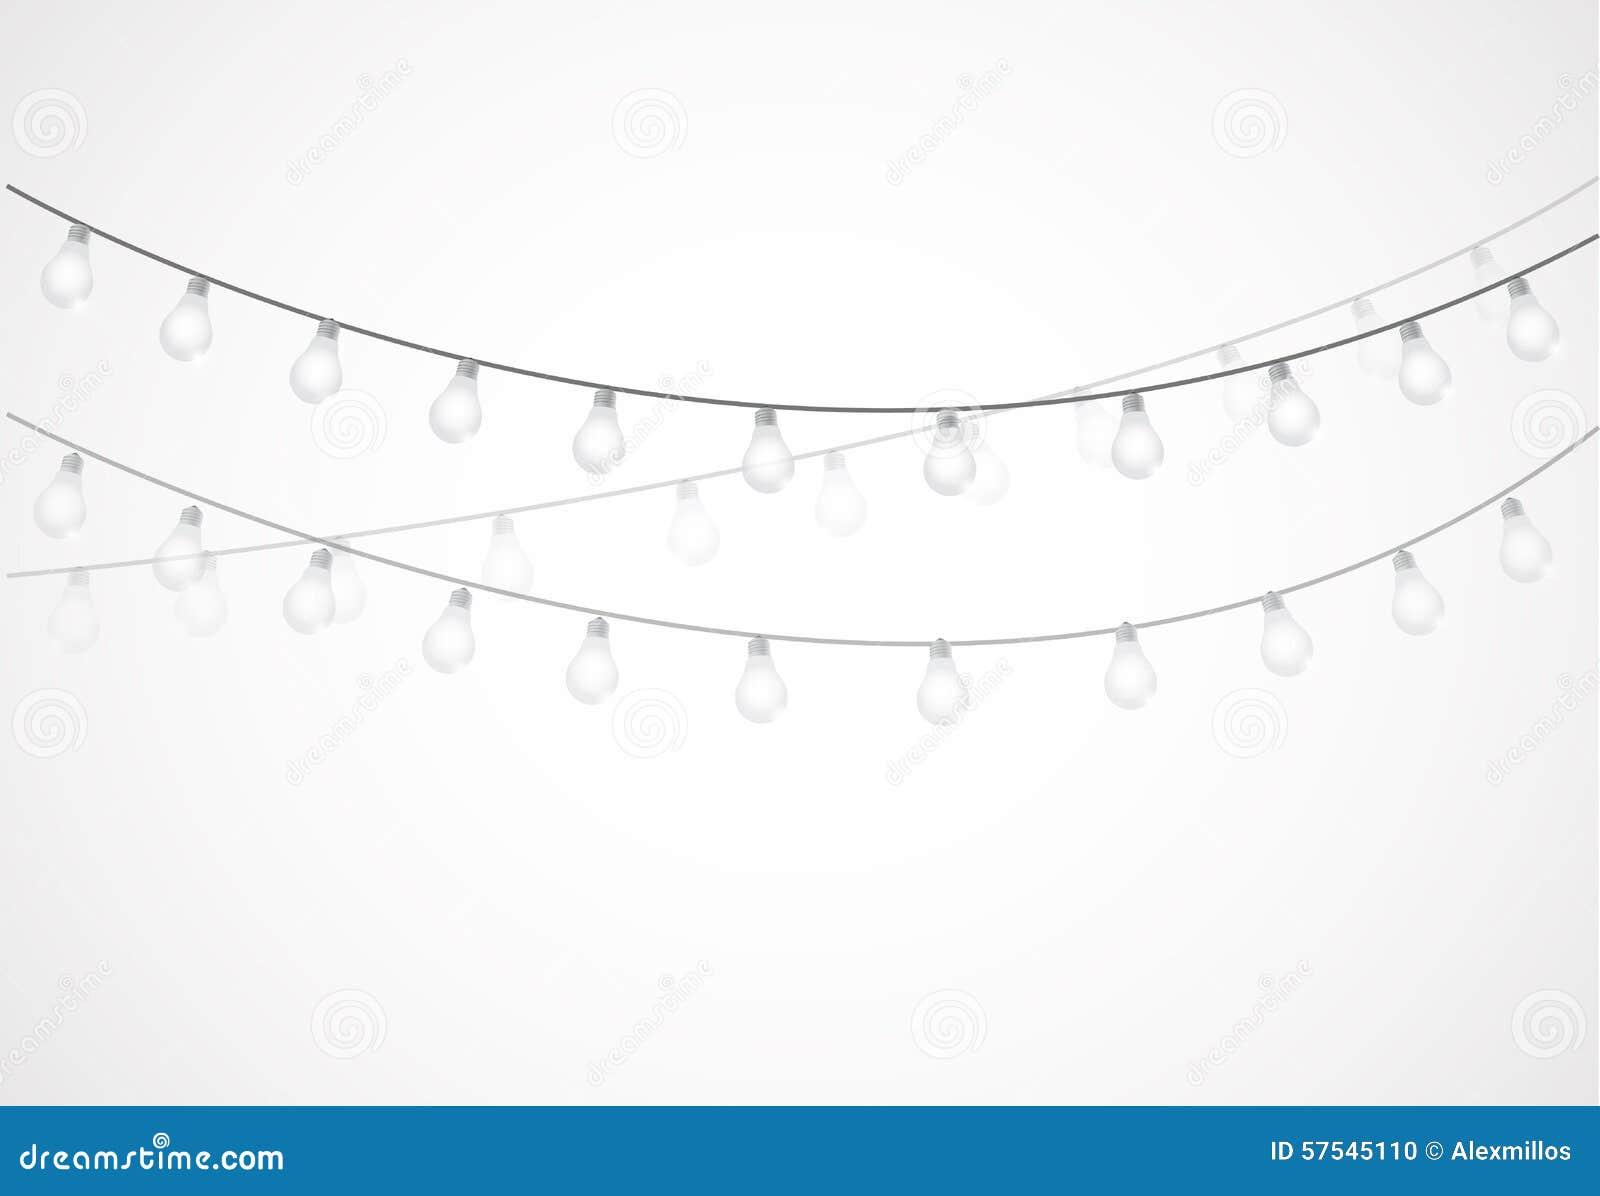 String Lights No Background : String Of Lights. Hanging Light Bulbs Stock Illustration - Image: 57545110